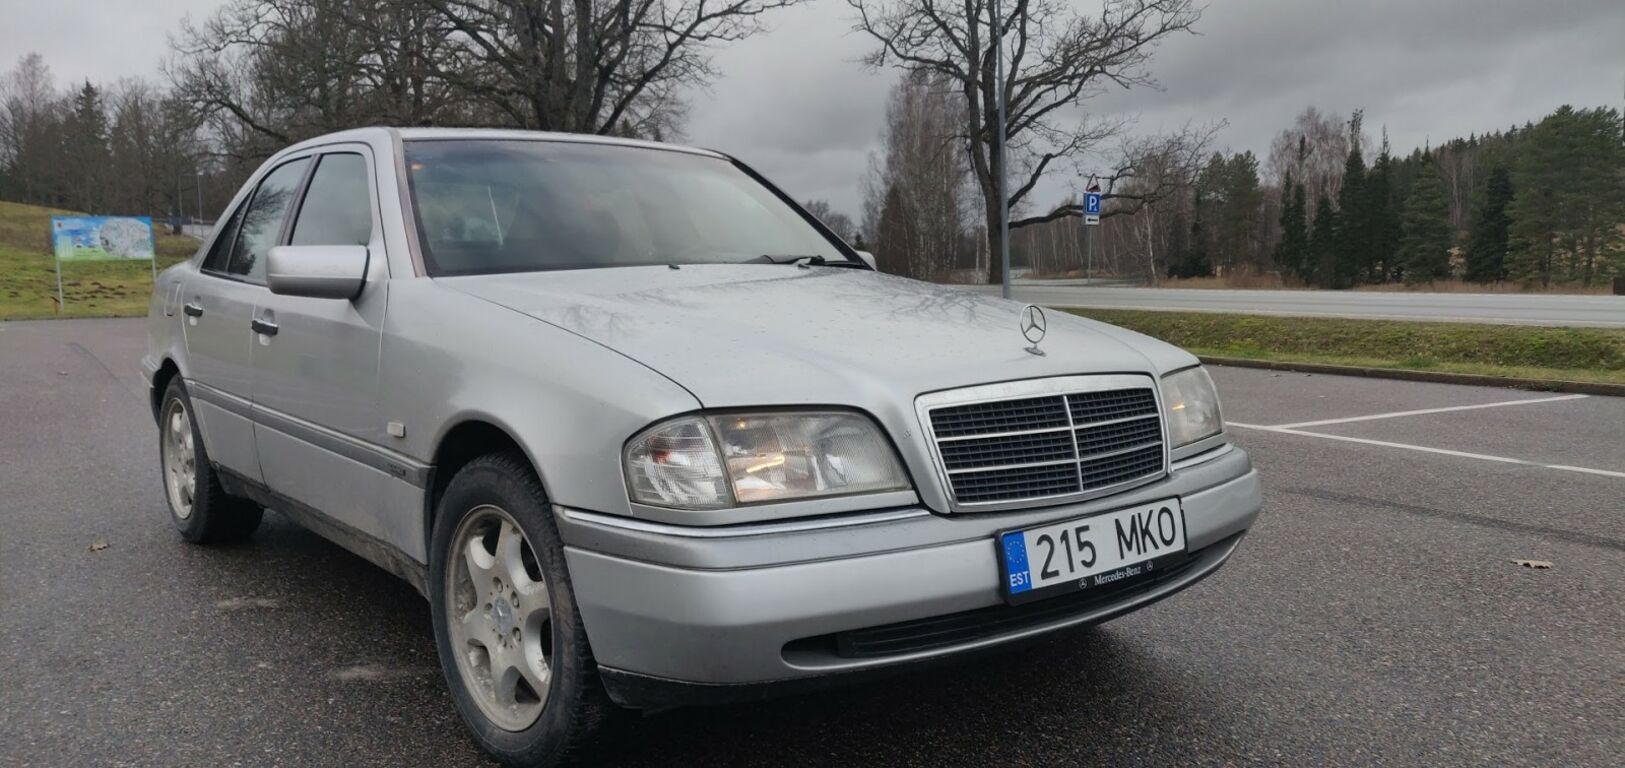 Mercedes-Benz C 220 Elegance 2.2 70kW